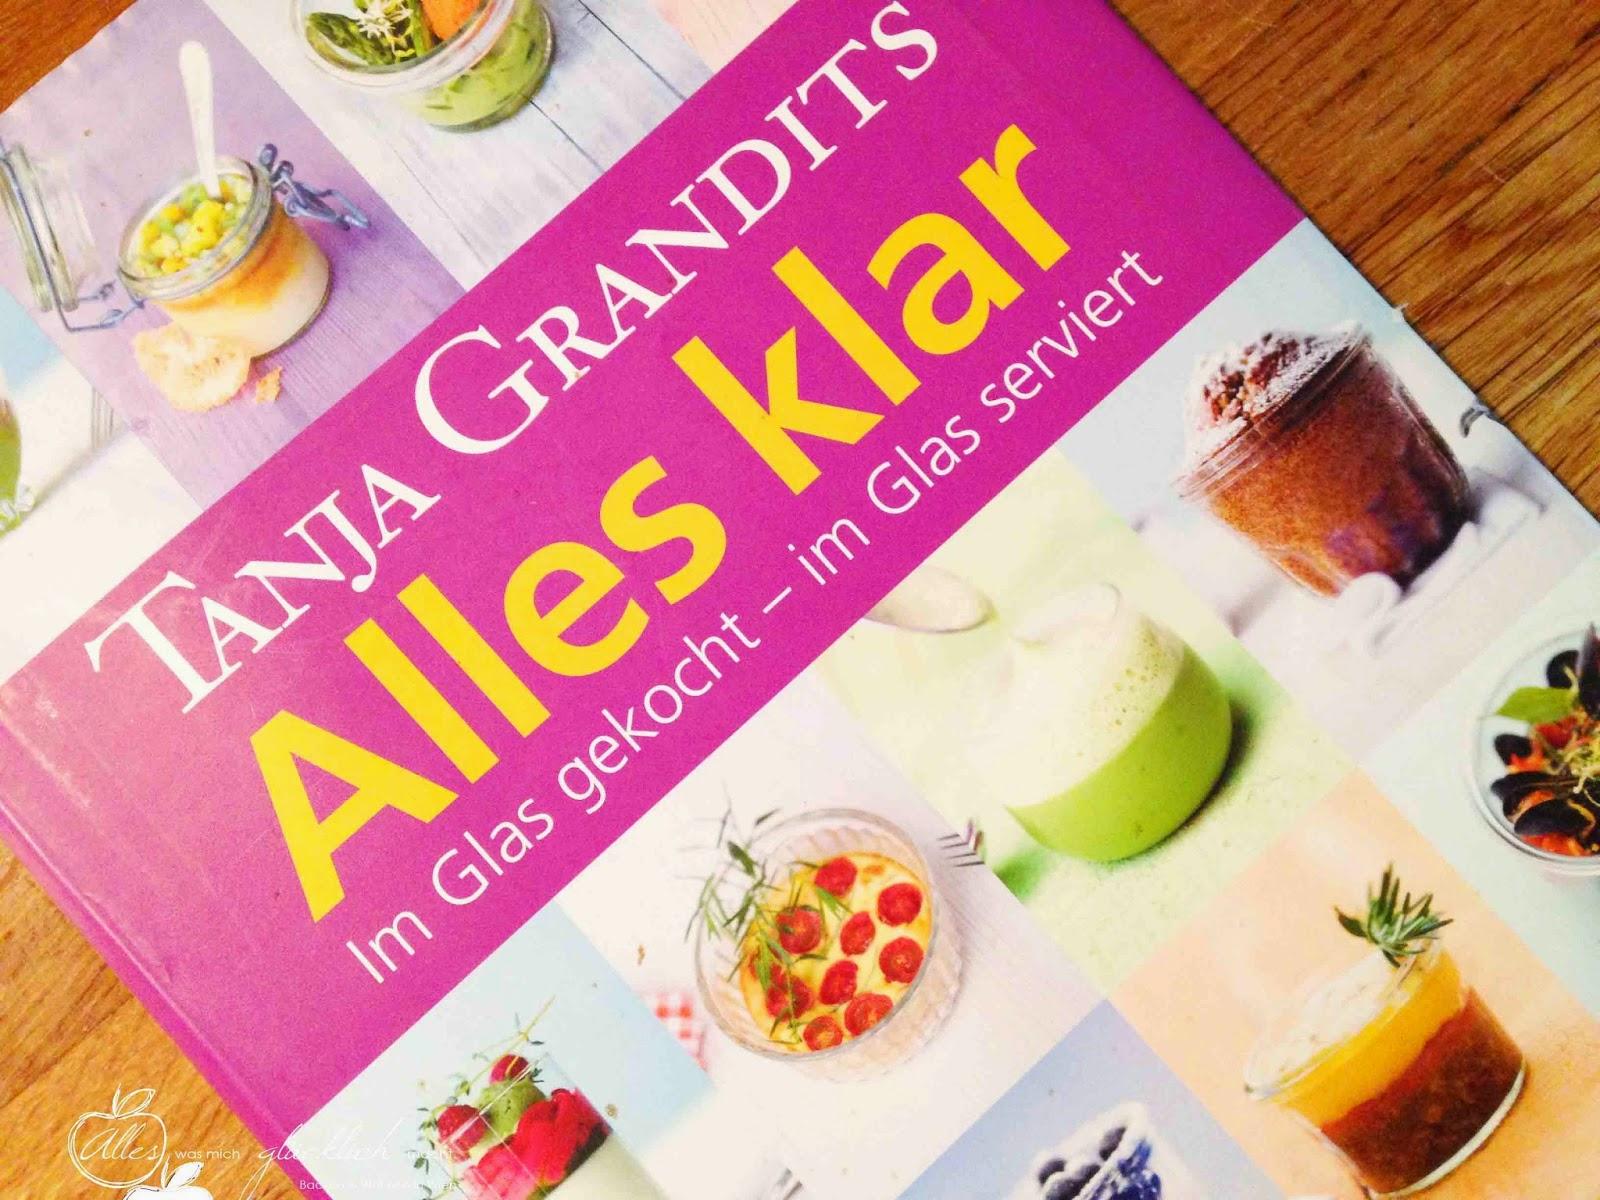 """Alles klar"" von Tanja Grandits"